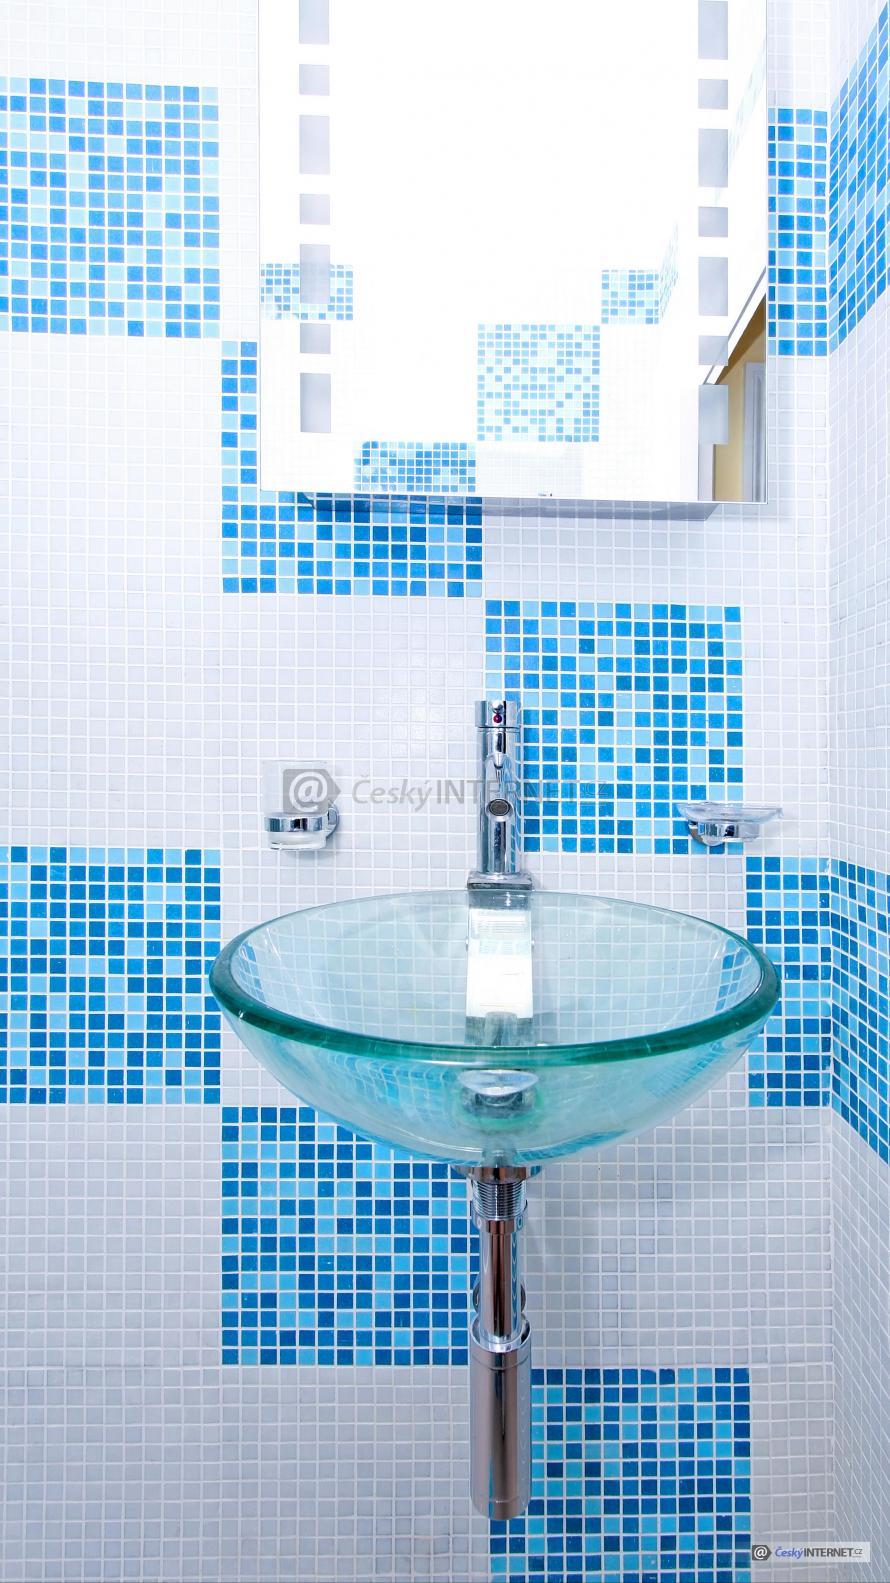 Detail rohu koupelny s umyvadlem a zrcadlem.